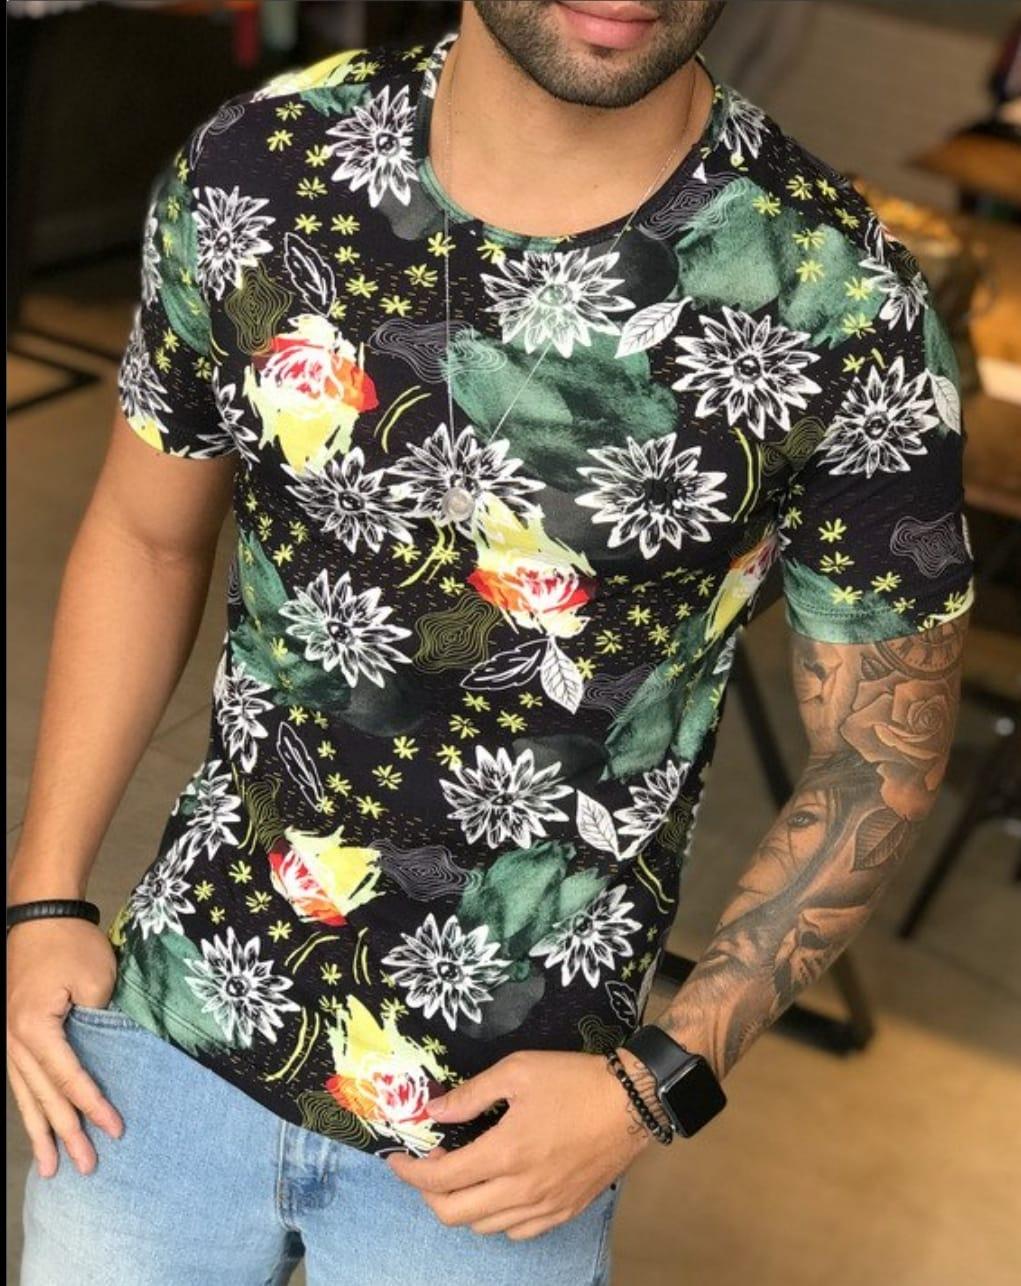 Camiseta M Artt  Preta Detalhes Flores  - Harpia Moda - Moda Masculina & Acessórios